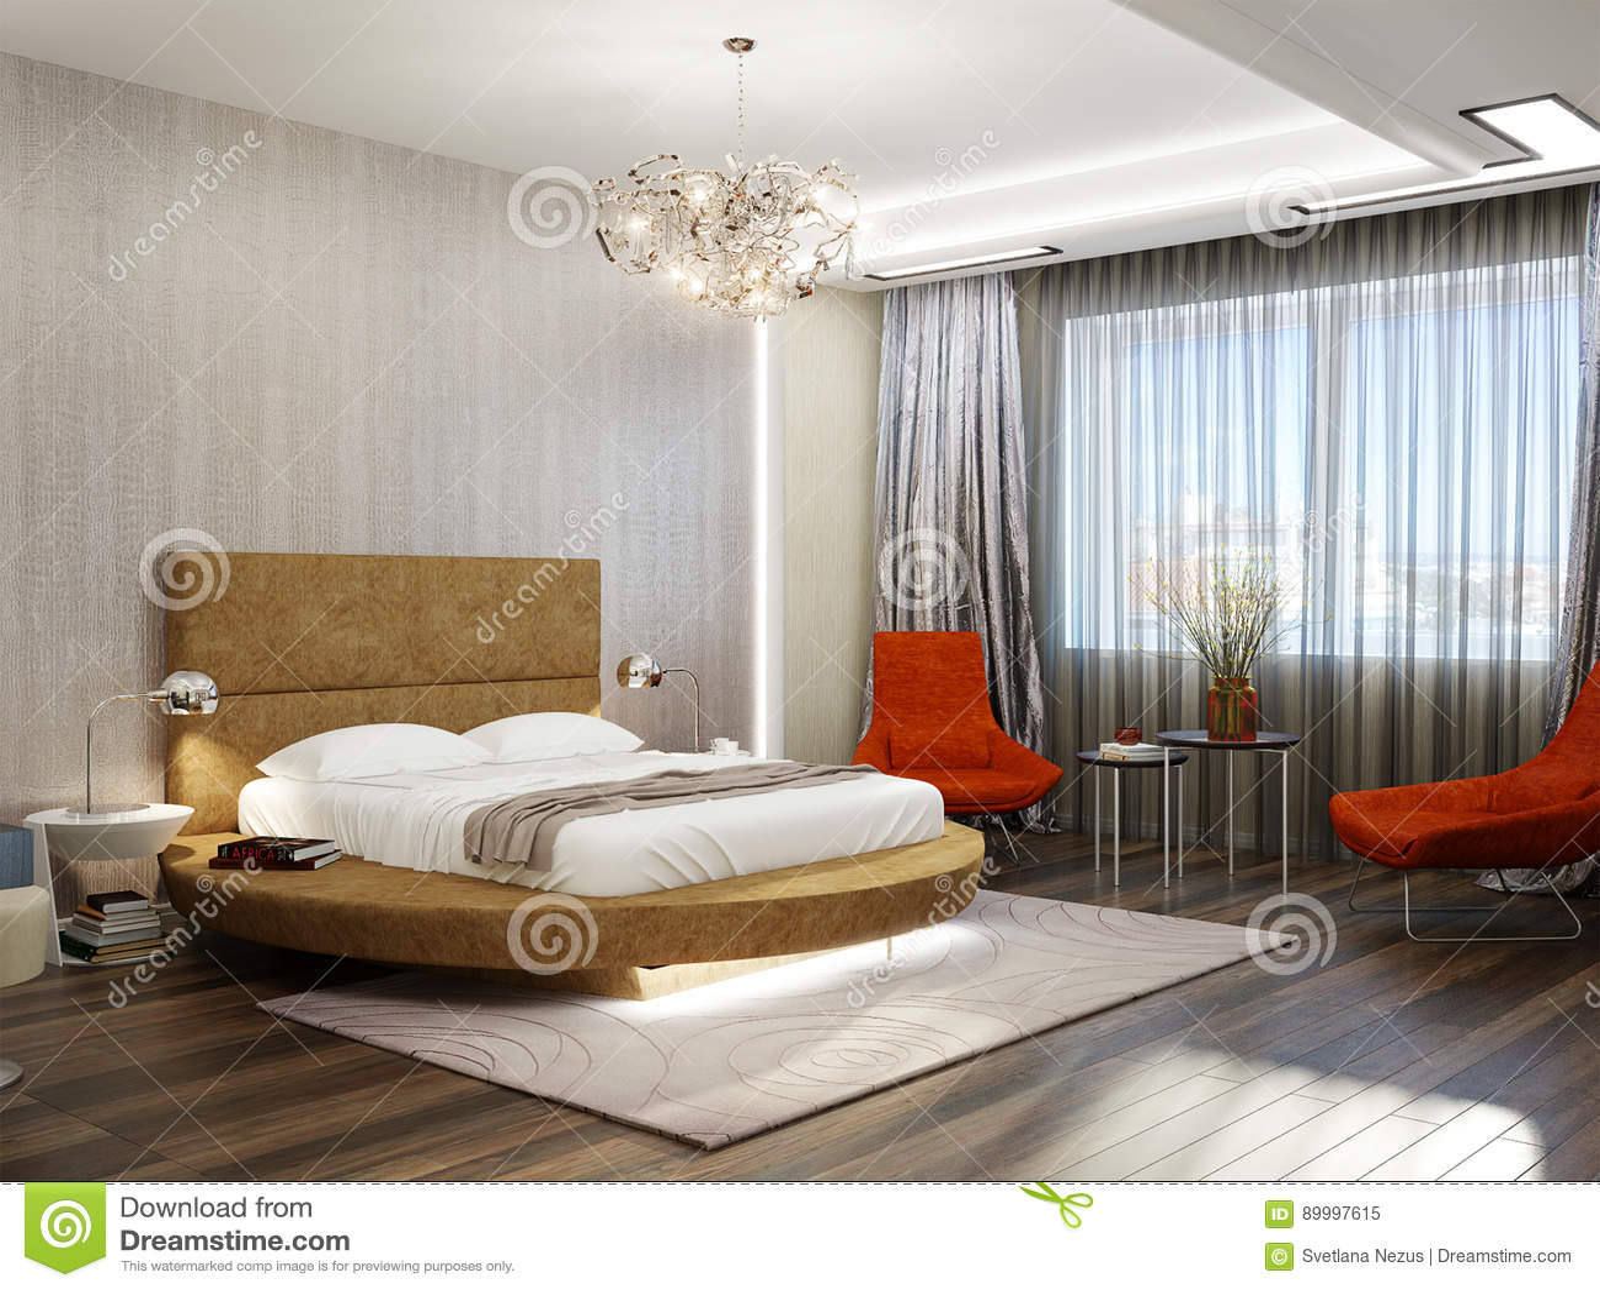 https://thumbs.dreamstime.com/z/modern-slaapkamer-binnenlands-ontwerp-met-rond-bed-89997615.jpg